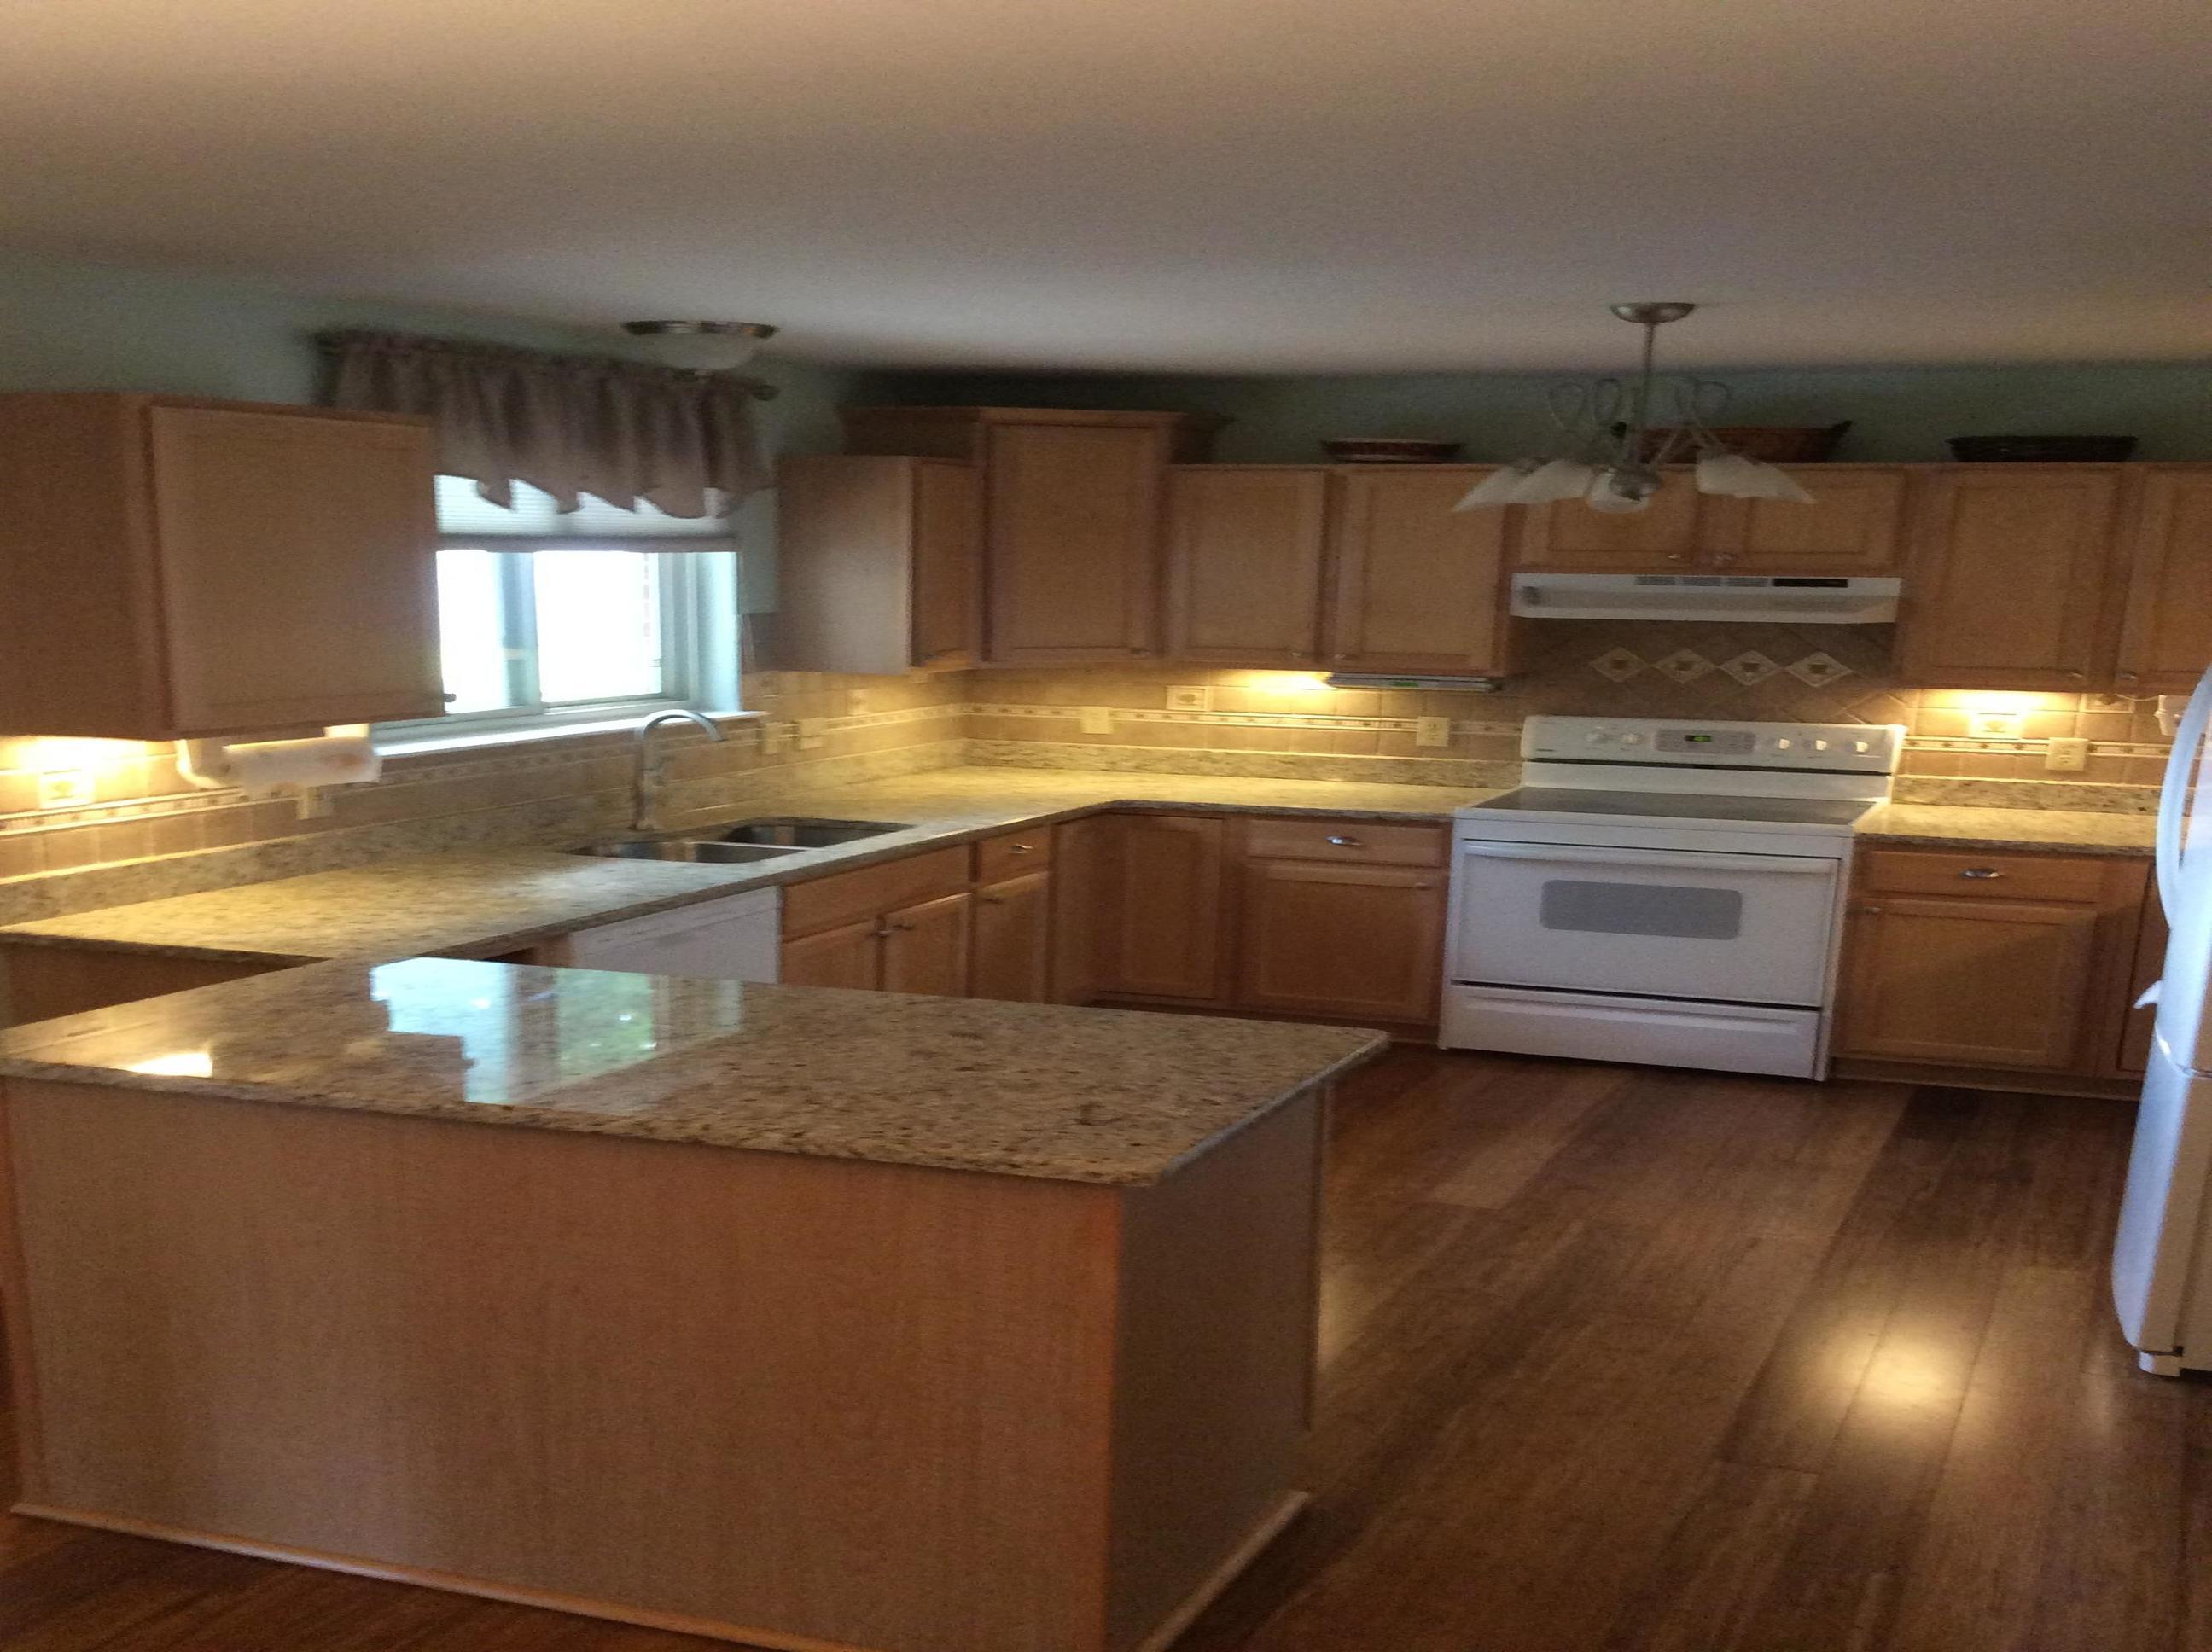 Kitchens With Giallo Ornamental Granite Q Stone Inc Masonry And Stone Contractors Madison Heights Michigan